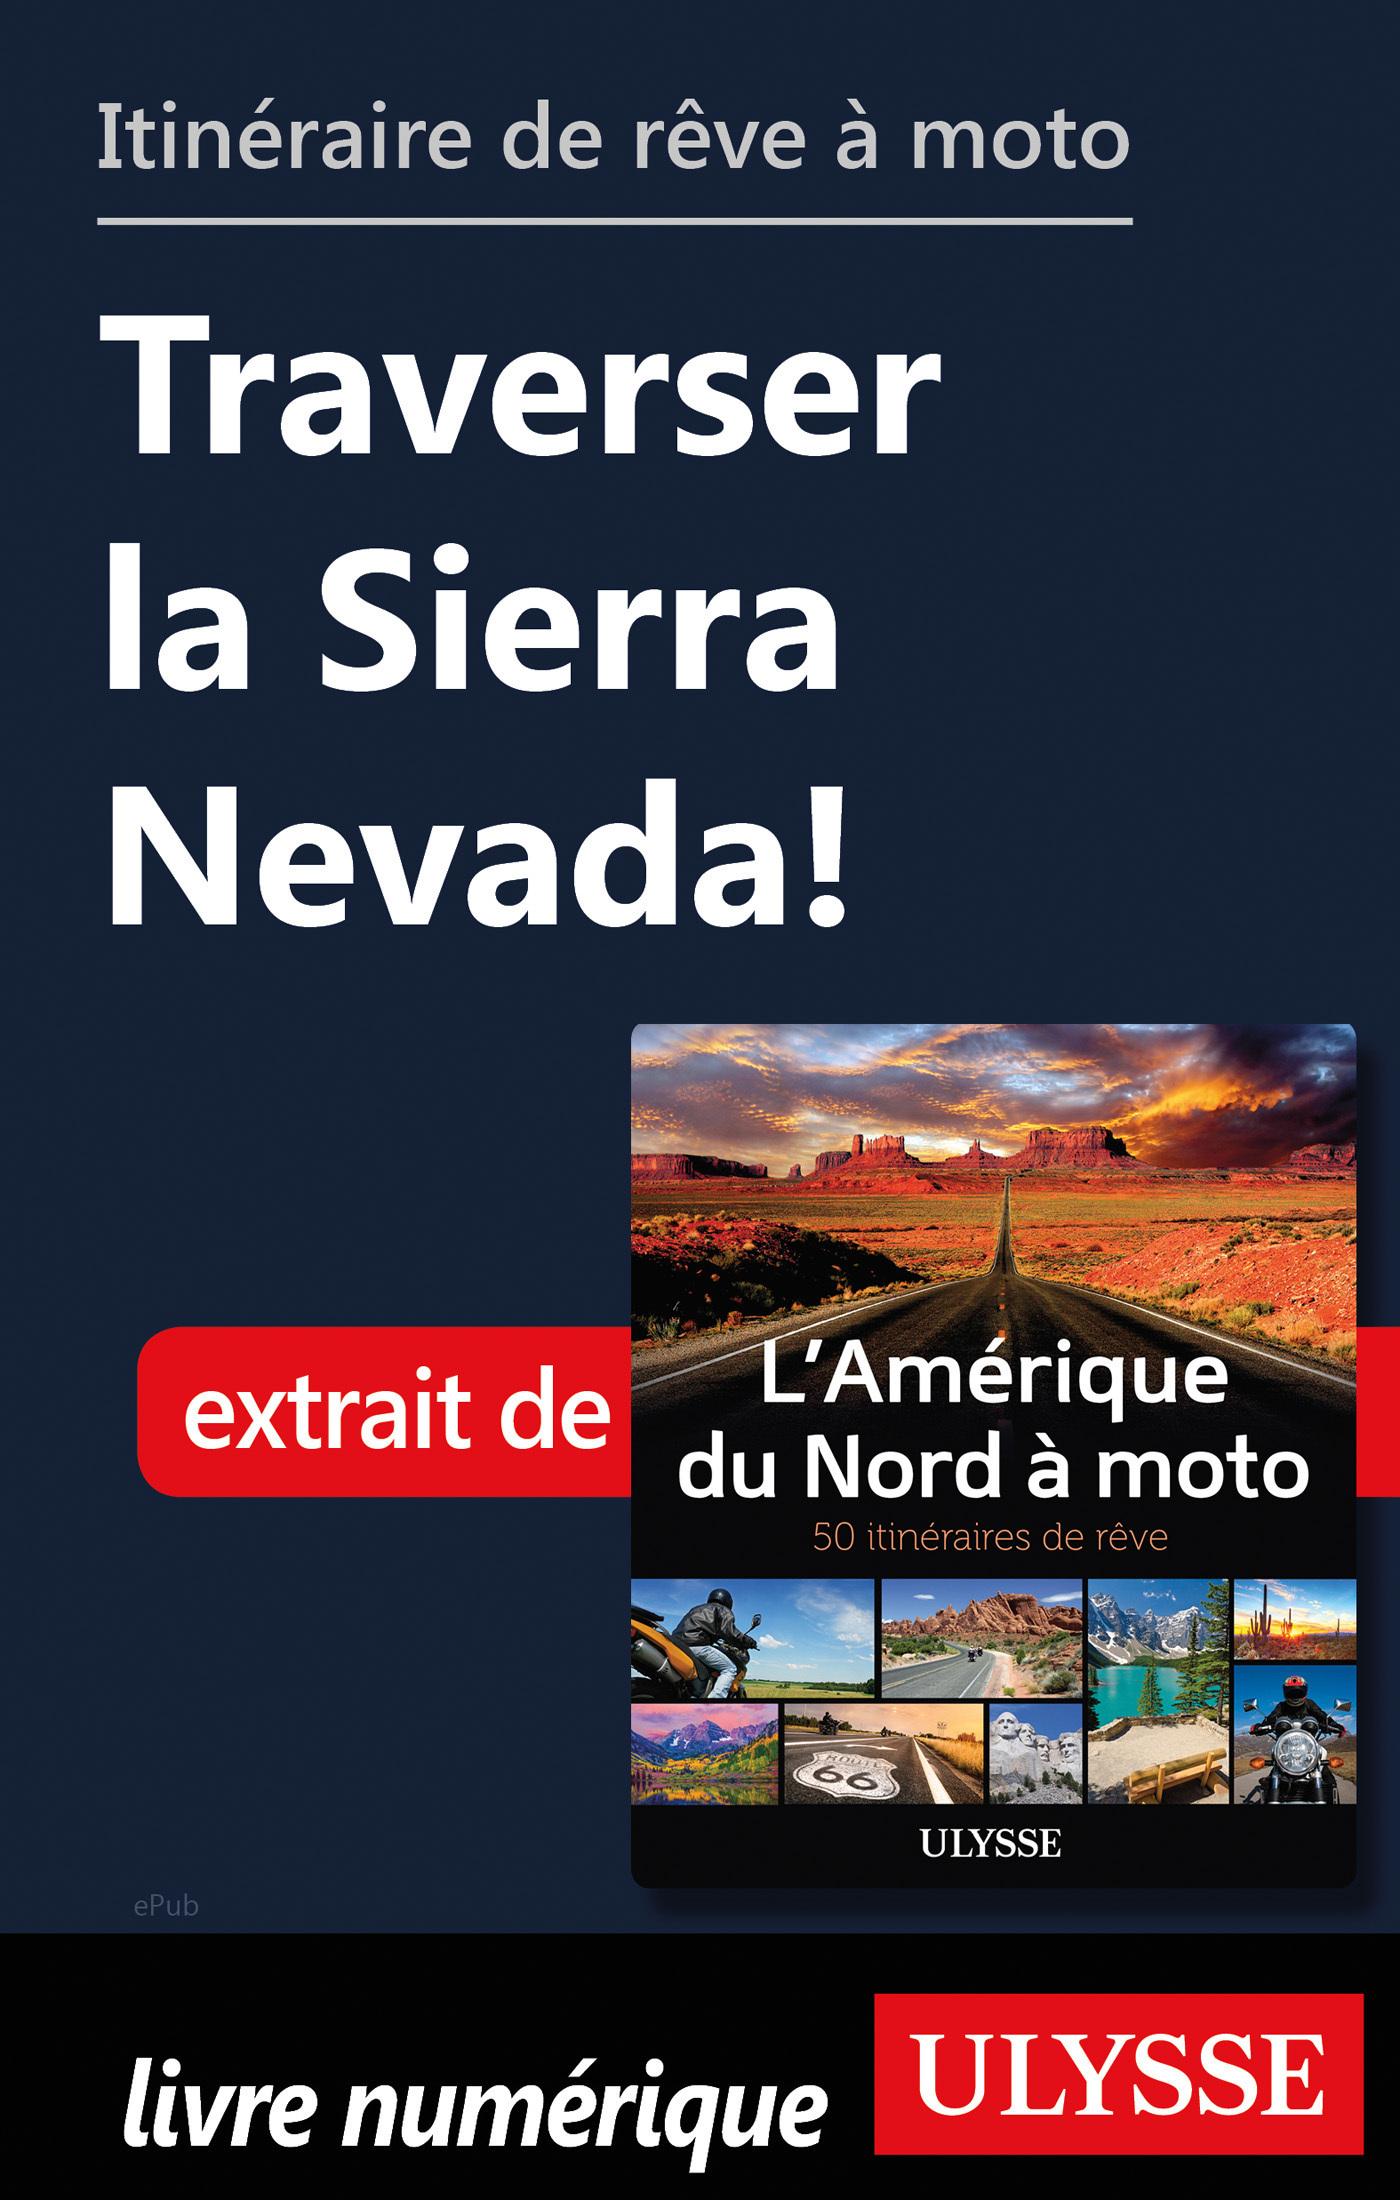 Itinéraire de rêve à moto - Traverser la Sierra Nevada !